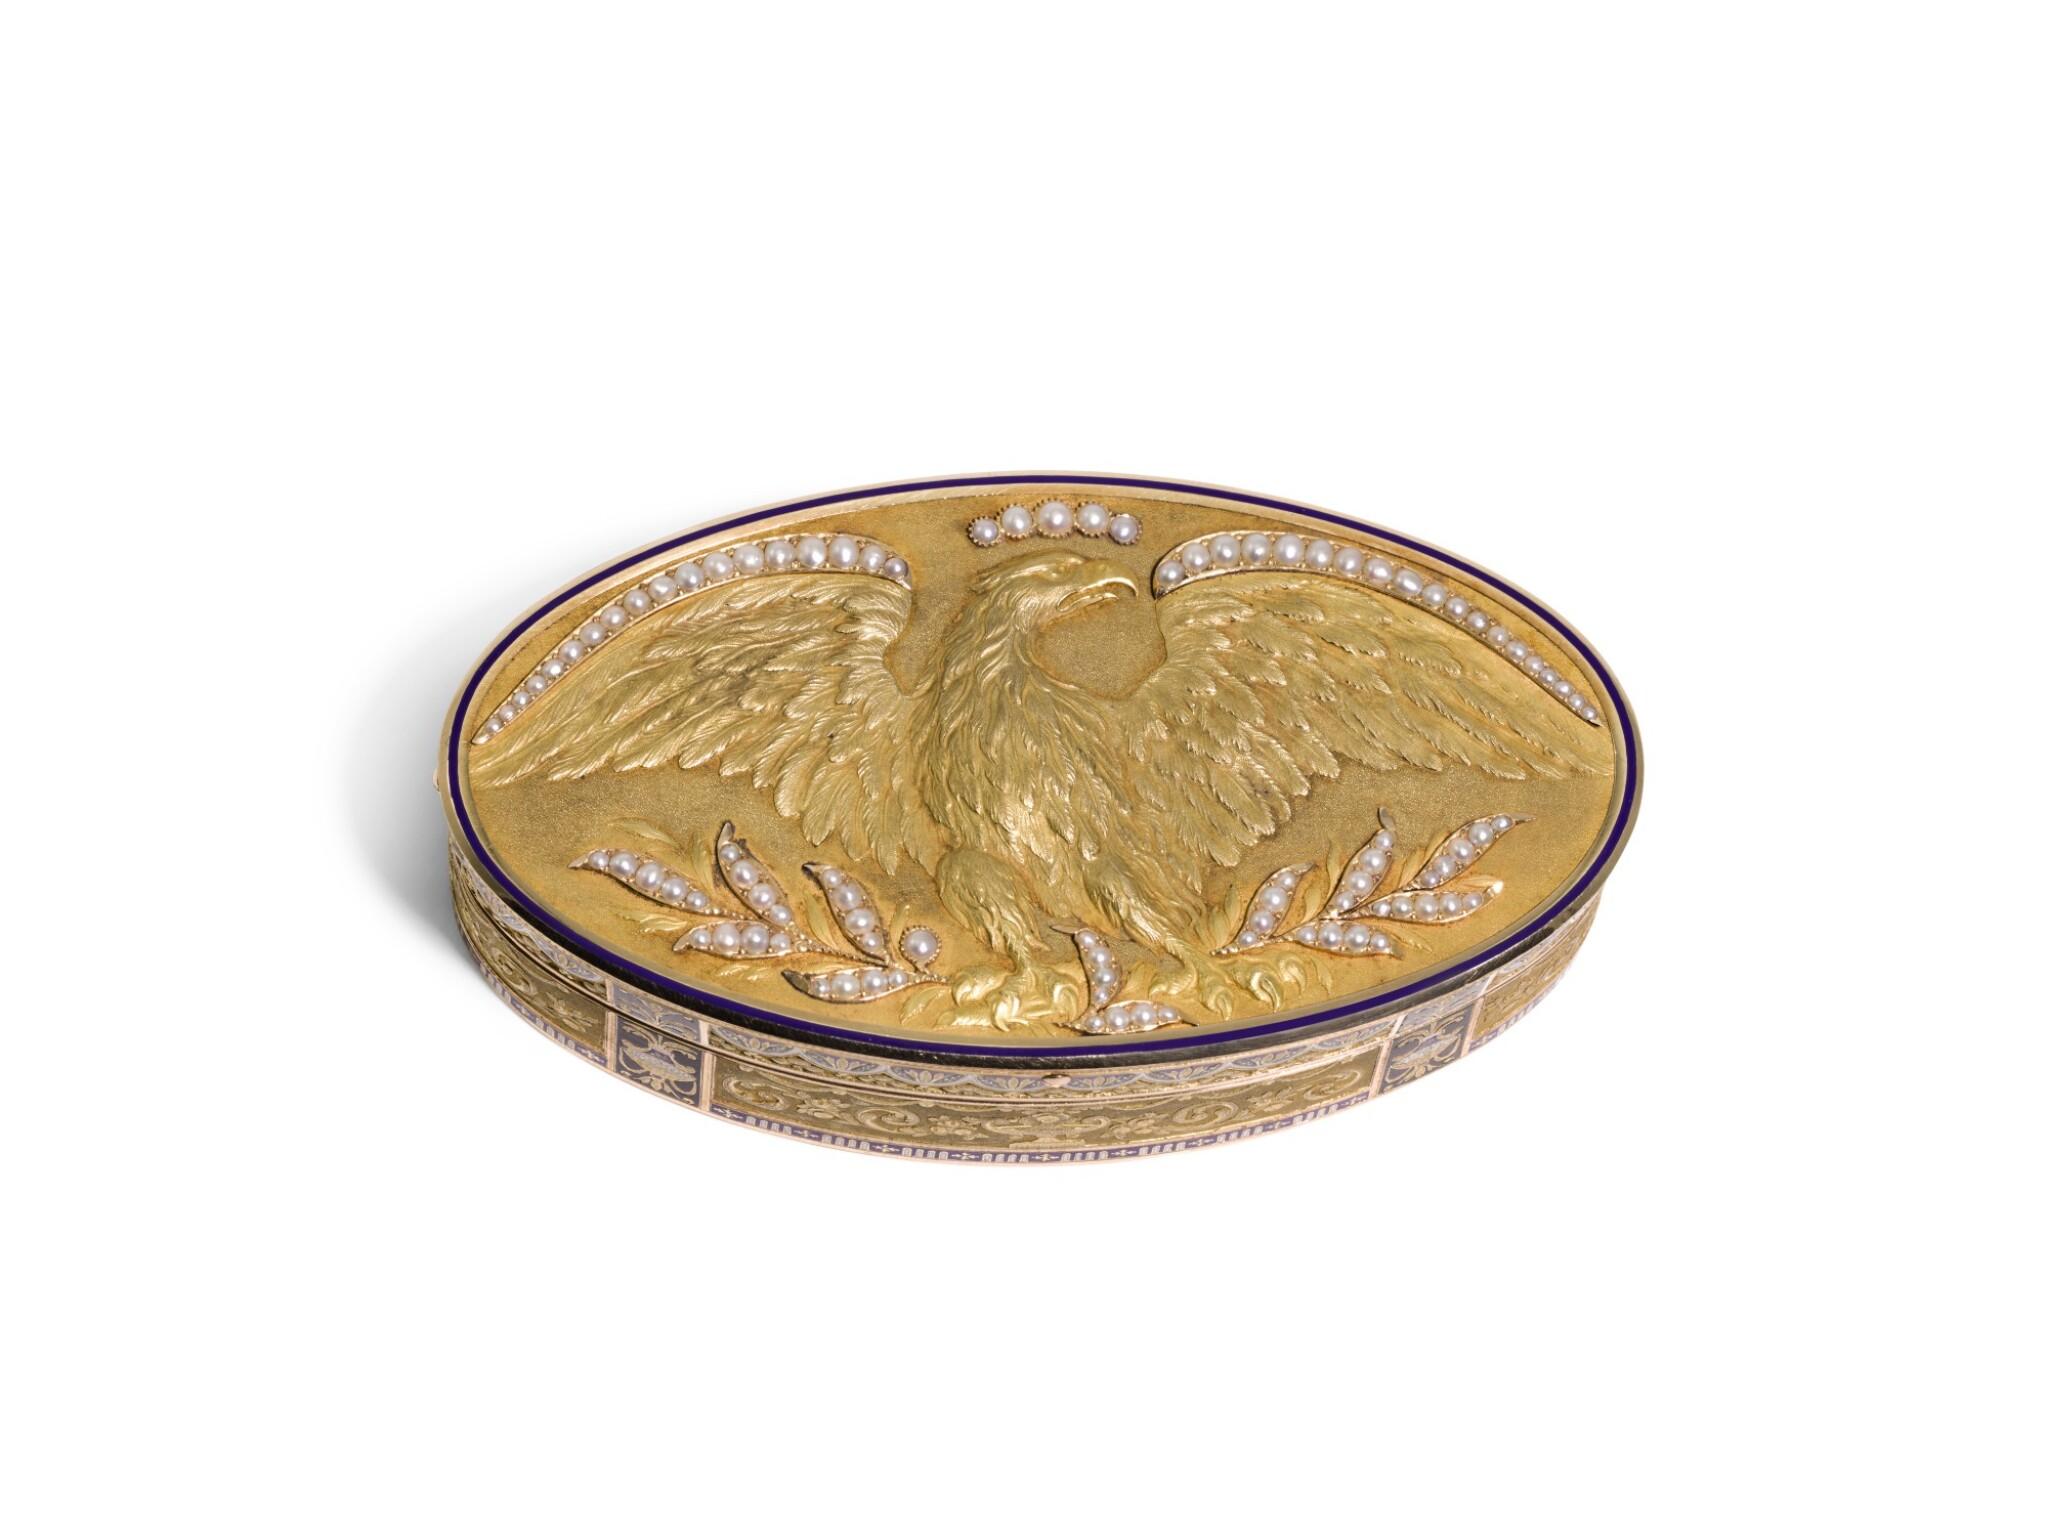 A GOLD, ENAMEL AND PEARL SNUFF BOX, RÉMOND, LAMY, MERCIER & CO., GENEVA, CIRCA 1814